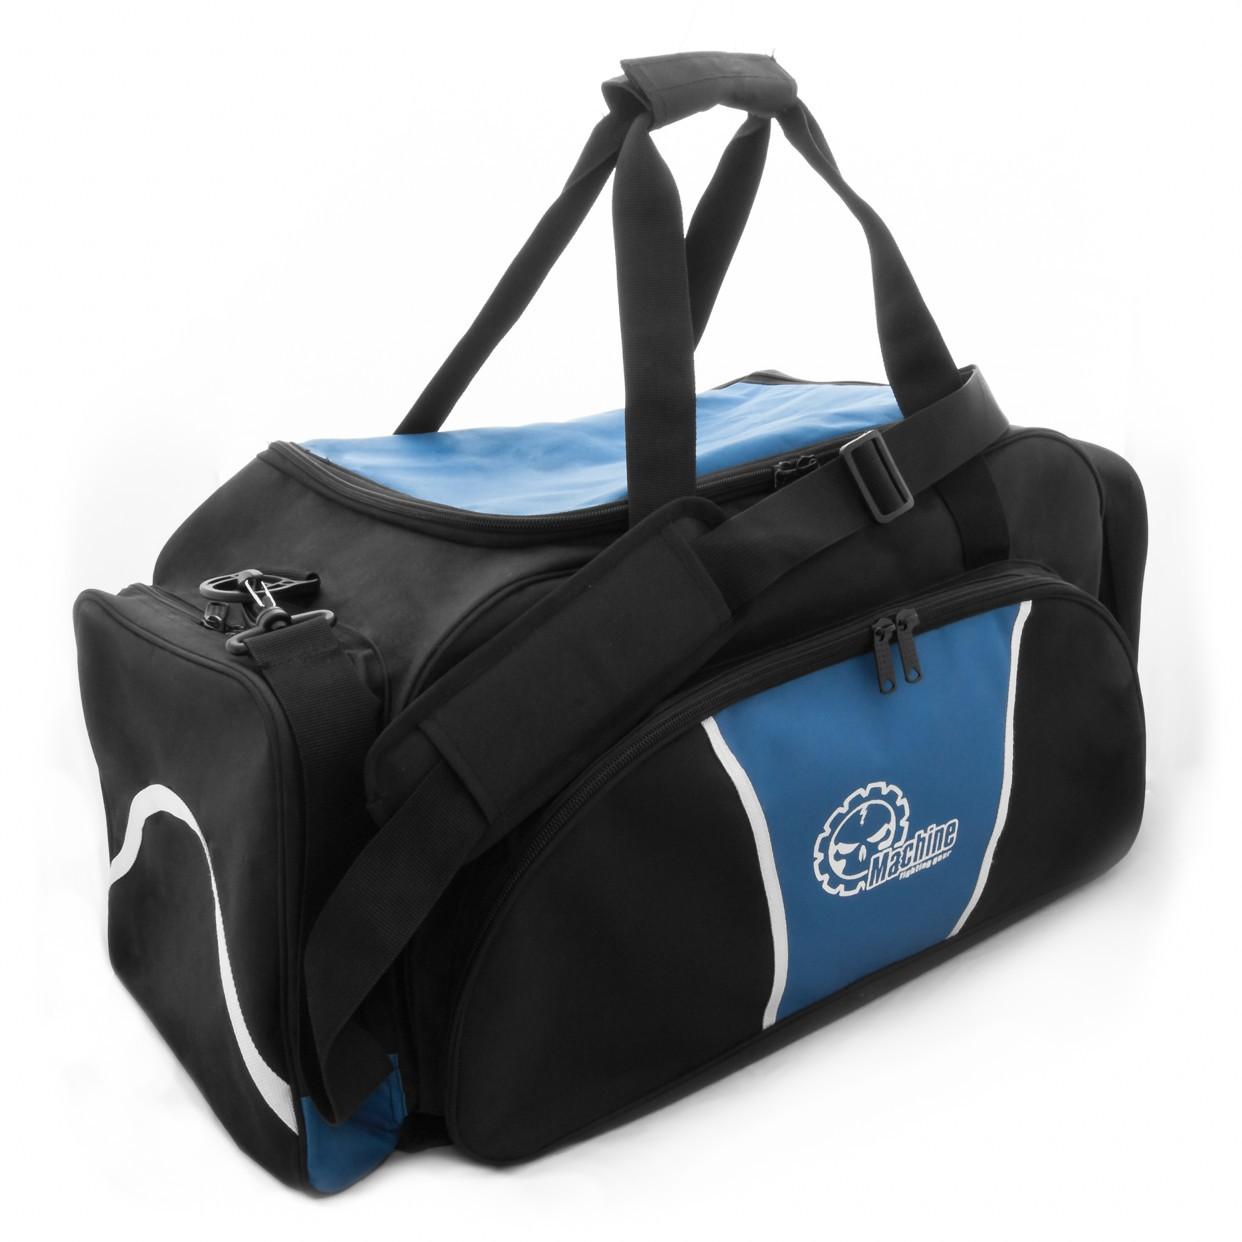 Sportovní Taška Machine - černo / modrá